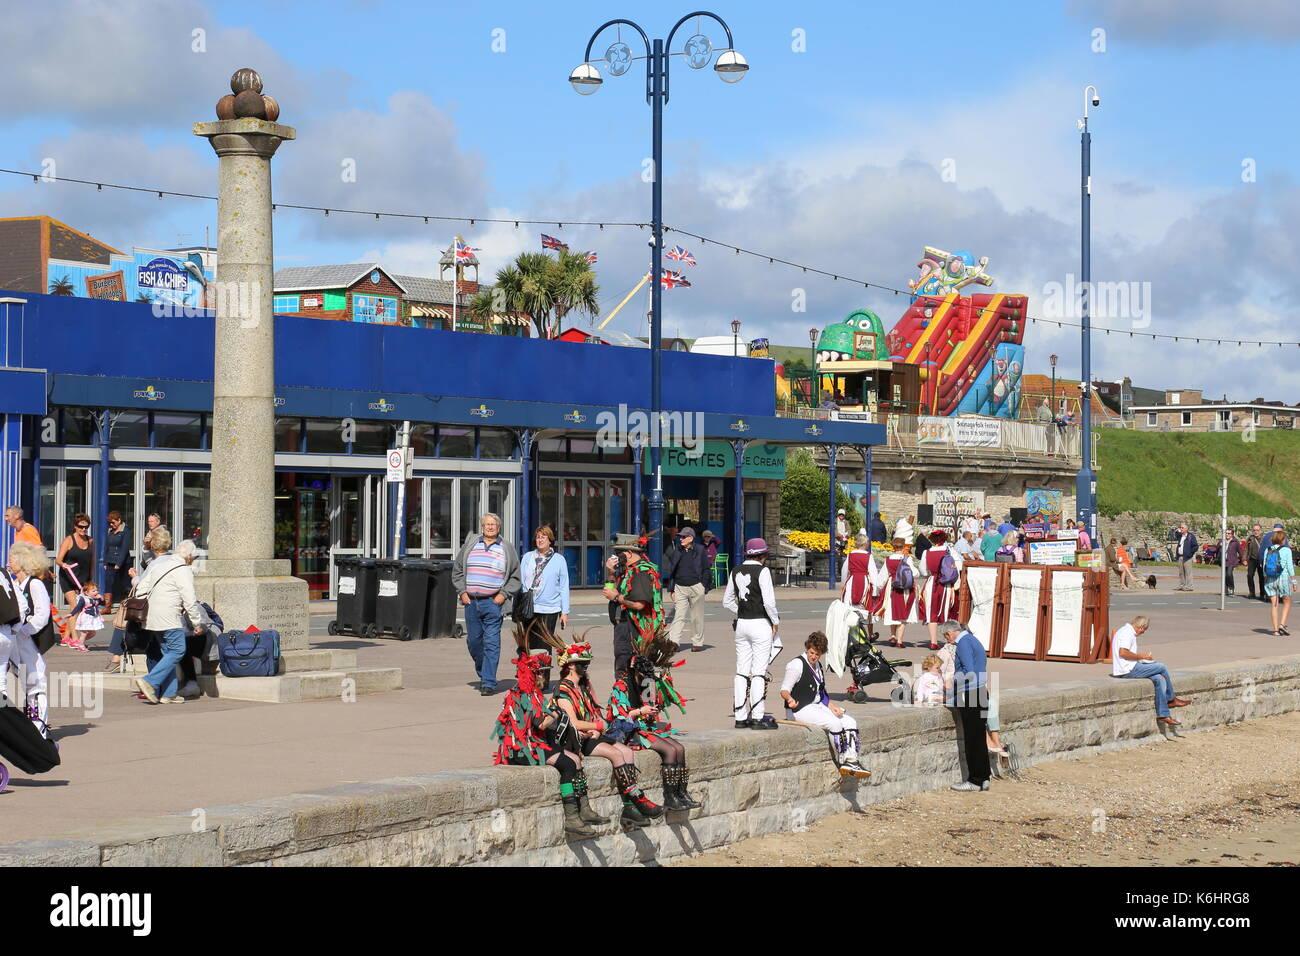 Taking a break, Shore Road, Swanage Folk Festival 2017, Isle of Purbeck, Dorset, England, Great Britain, United Kingdom, UK, Europe - Stock Image